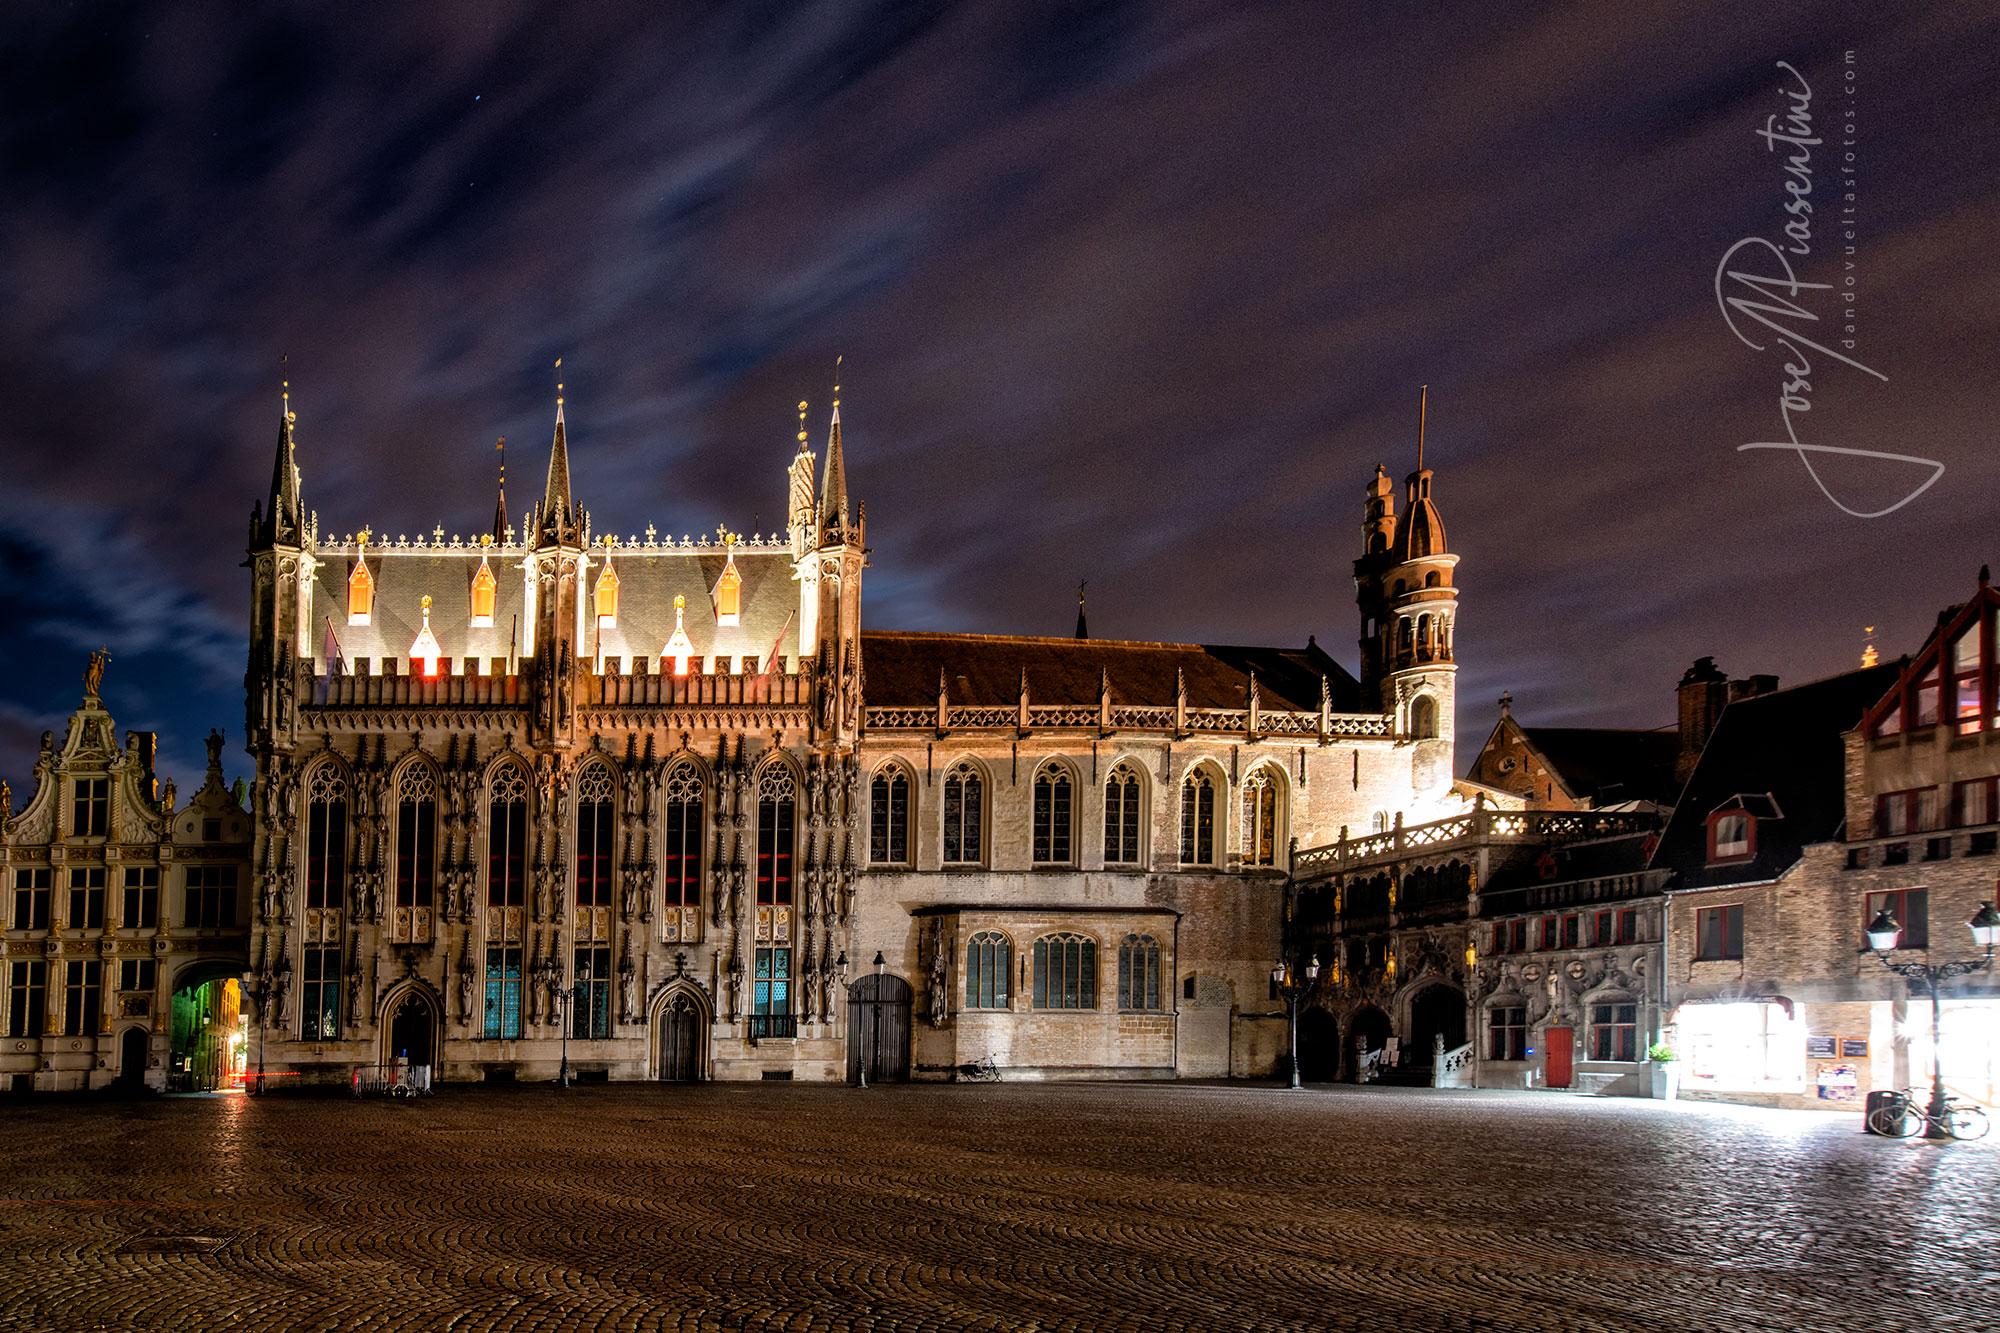 Grote Markt, patrimonio de la UNESCO